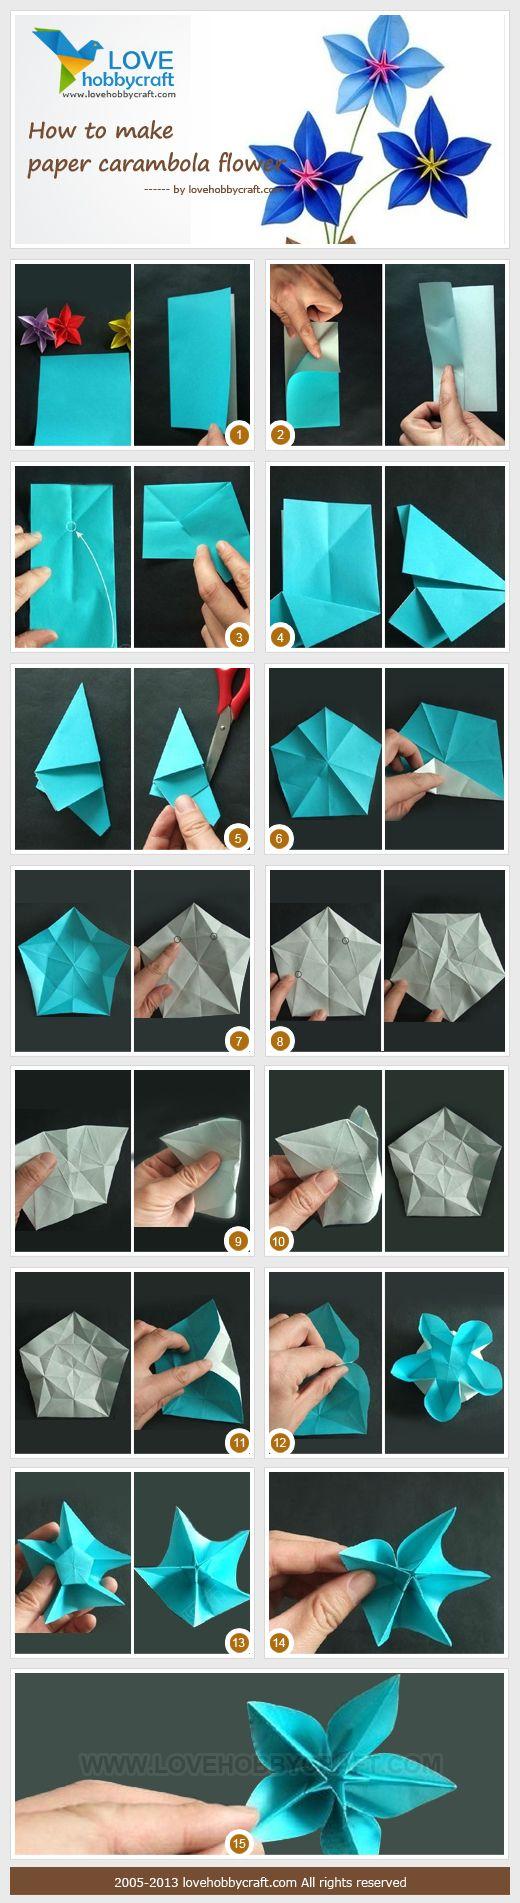 paper carambola flower